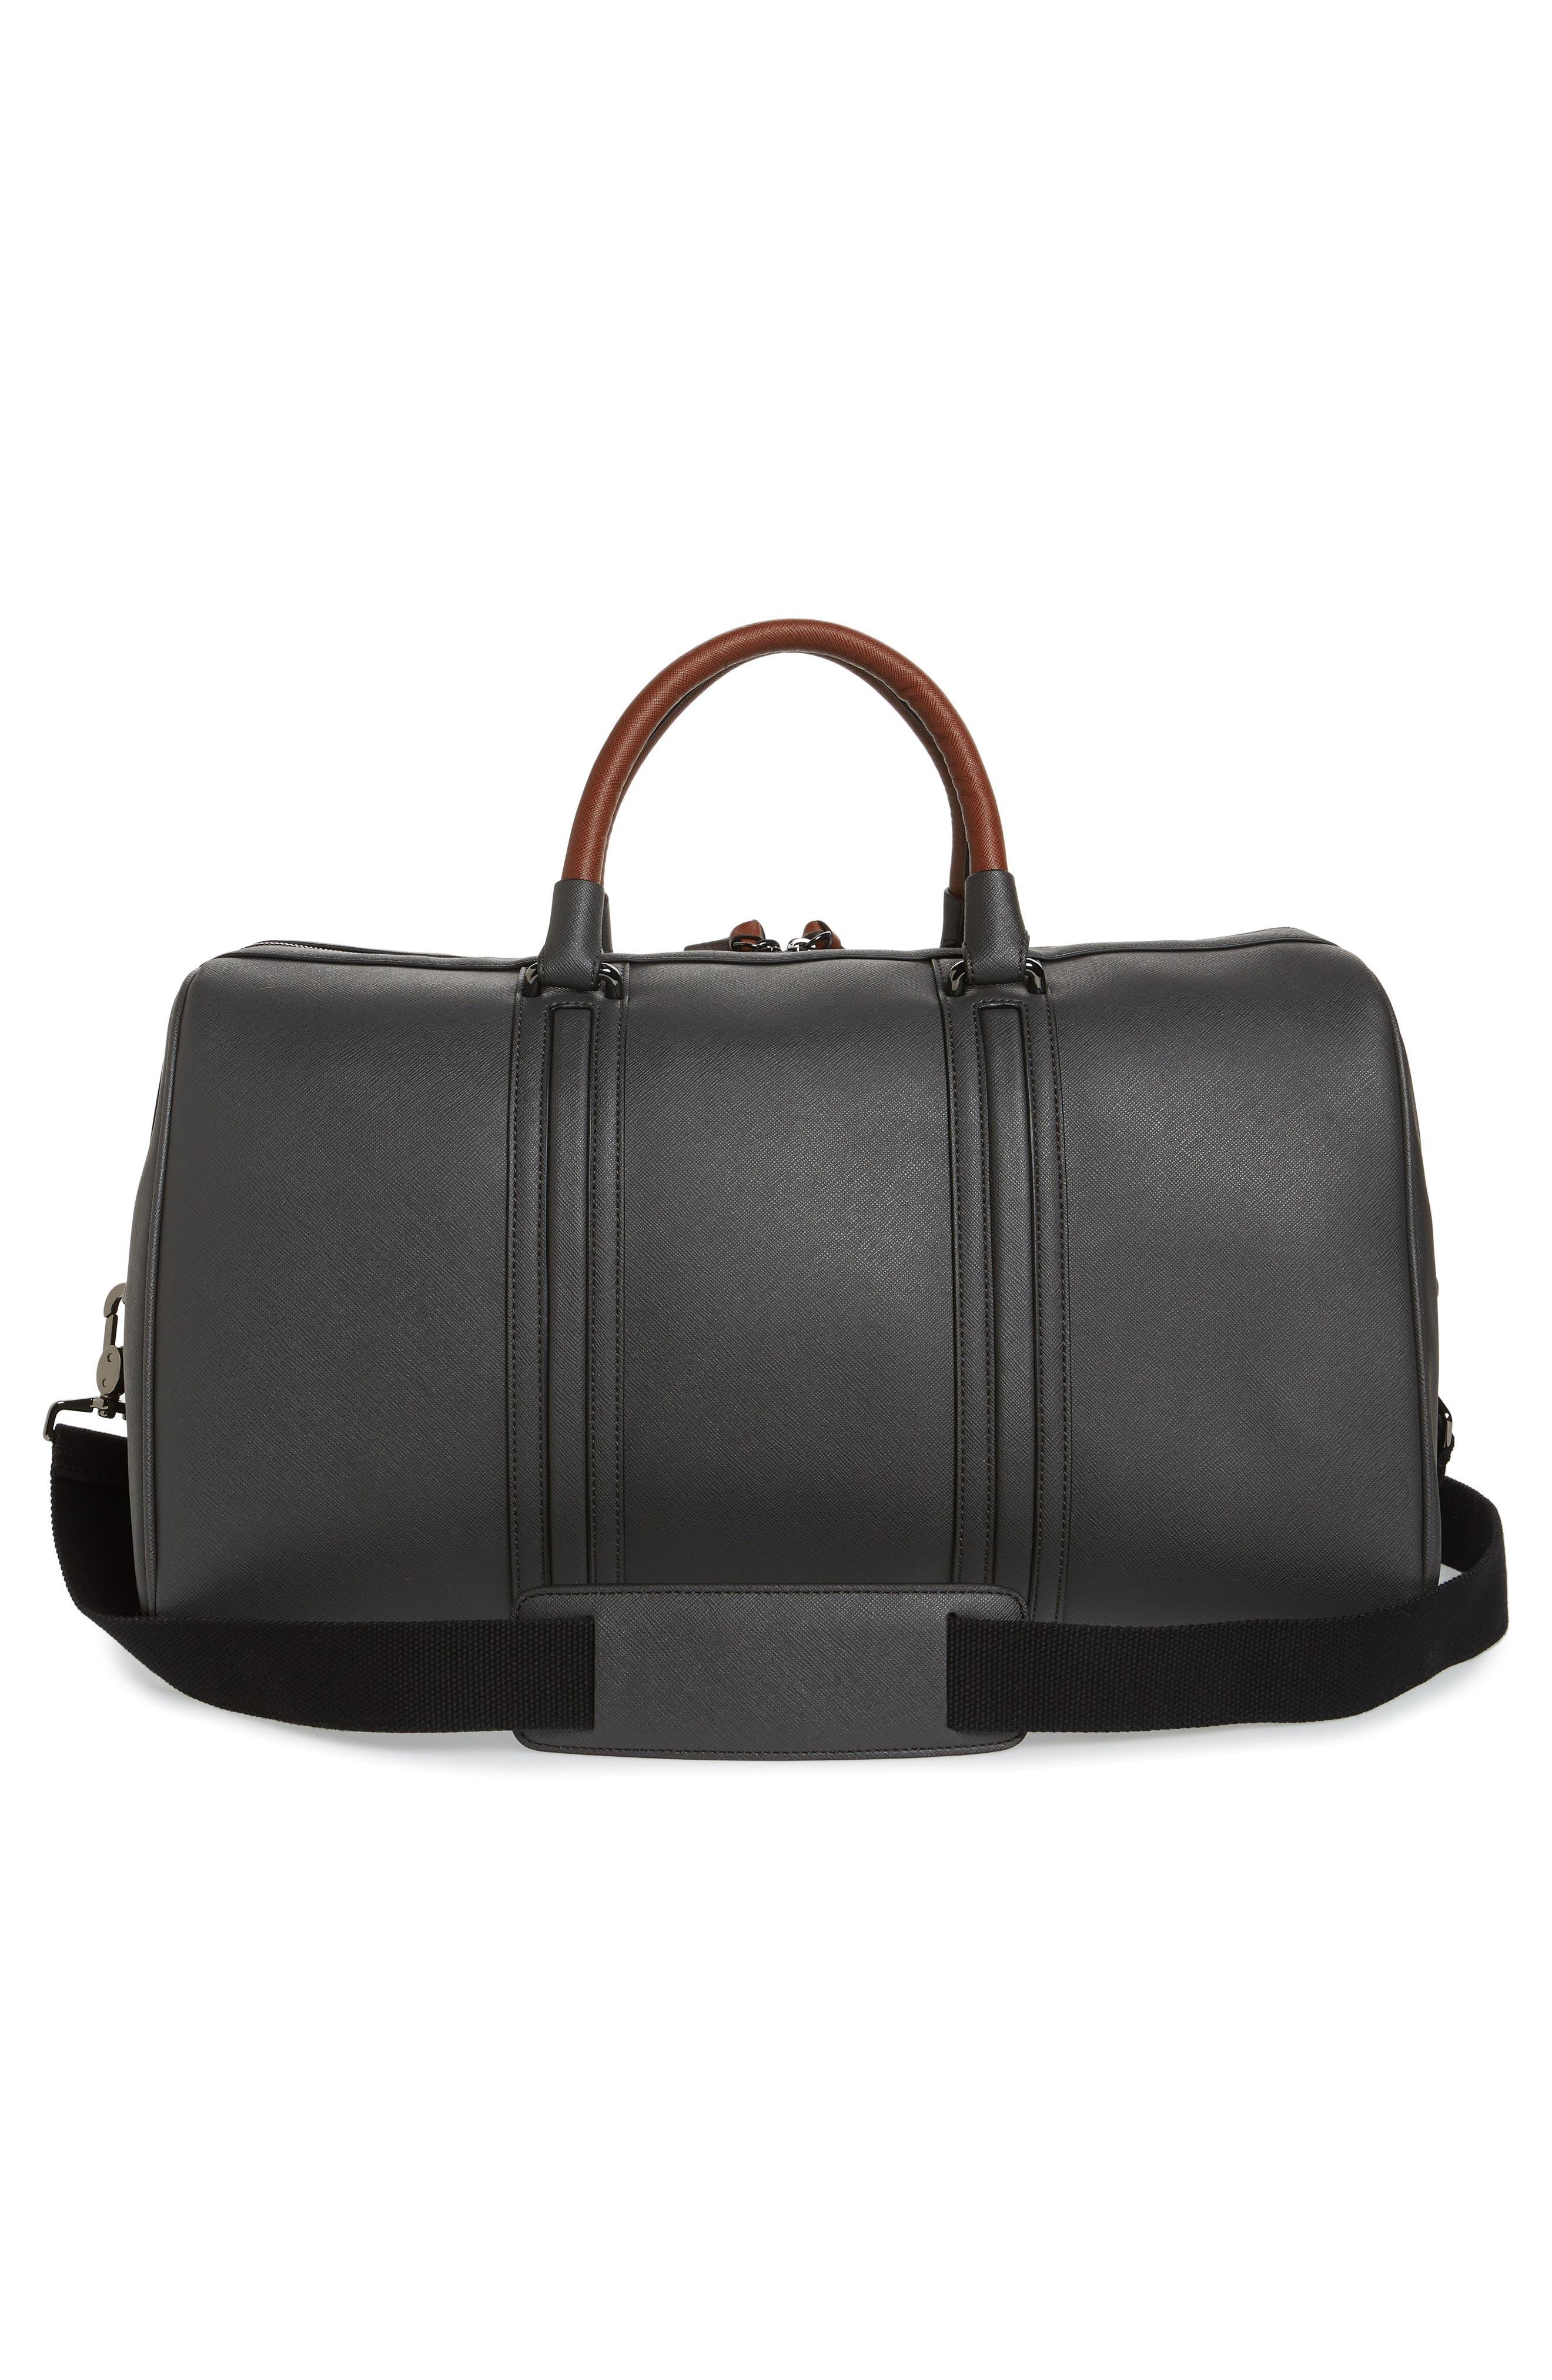 TED BAKER LONDON, Grankan Faux Leather Duffel Bag, Alternate thumbnail 3, color, 020